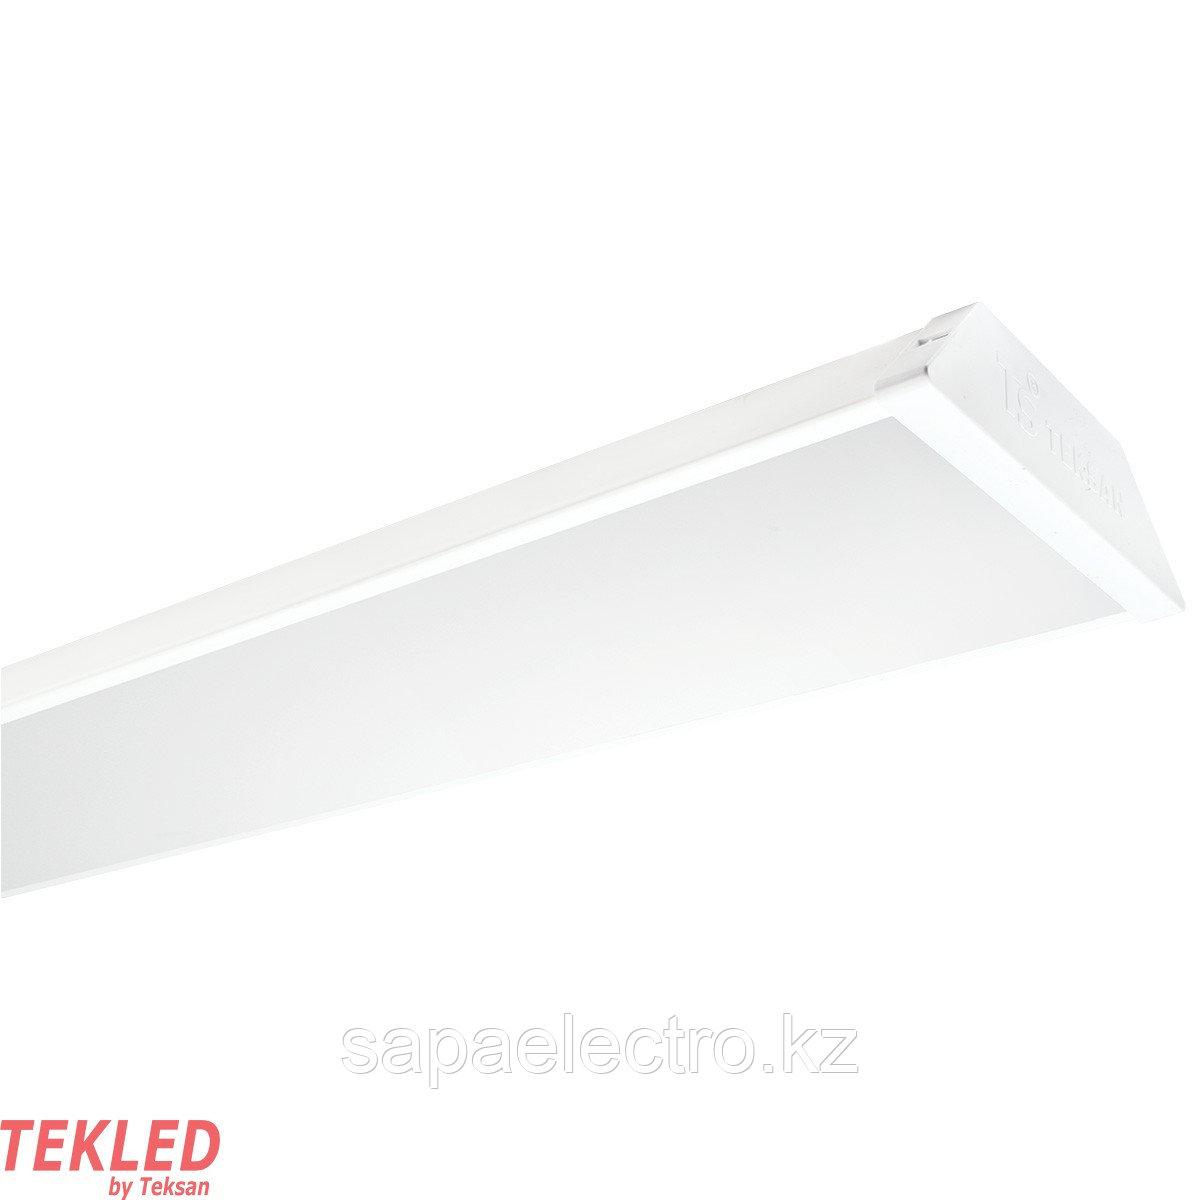 Св-к LEDTUBE LINEAR OPAL 1x9W+лампа (60см) IP20 MGL